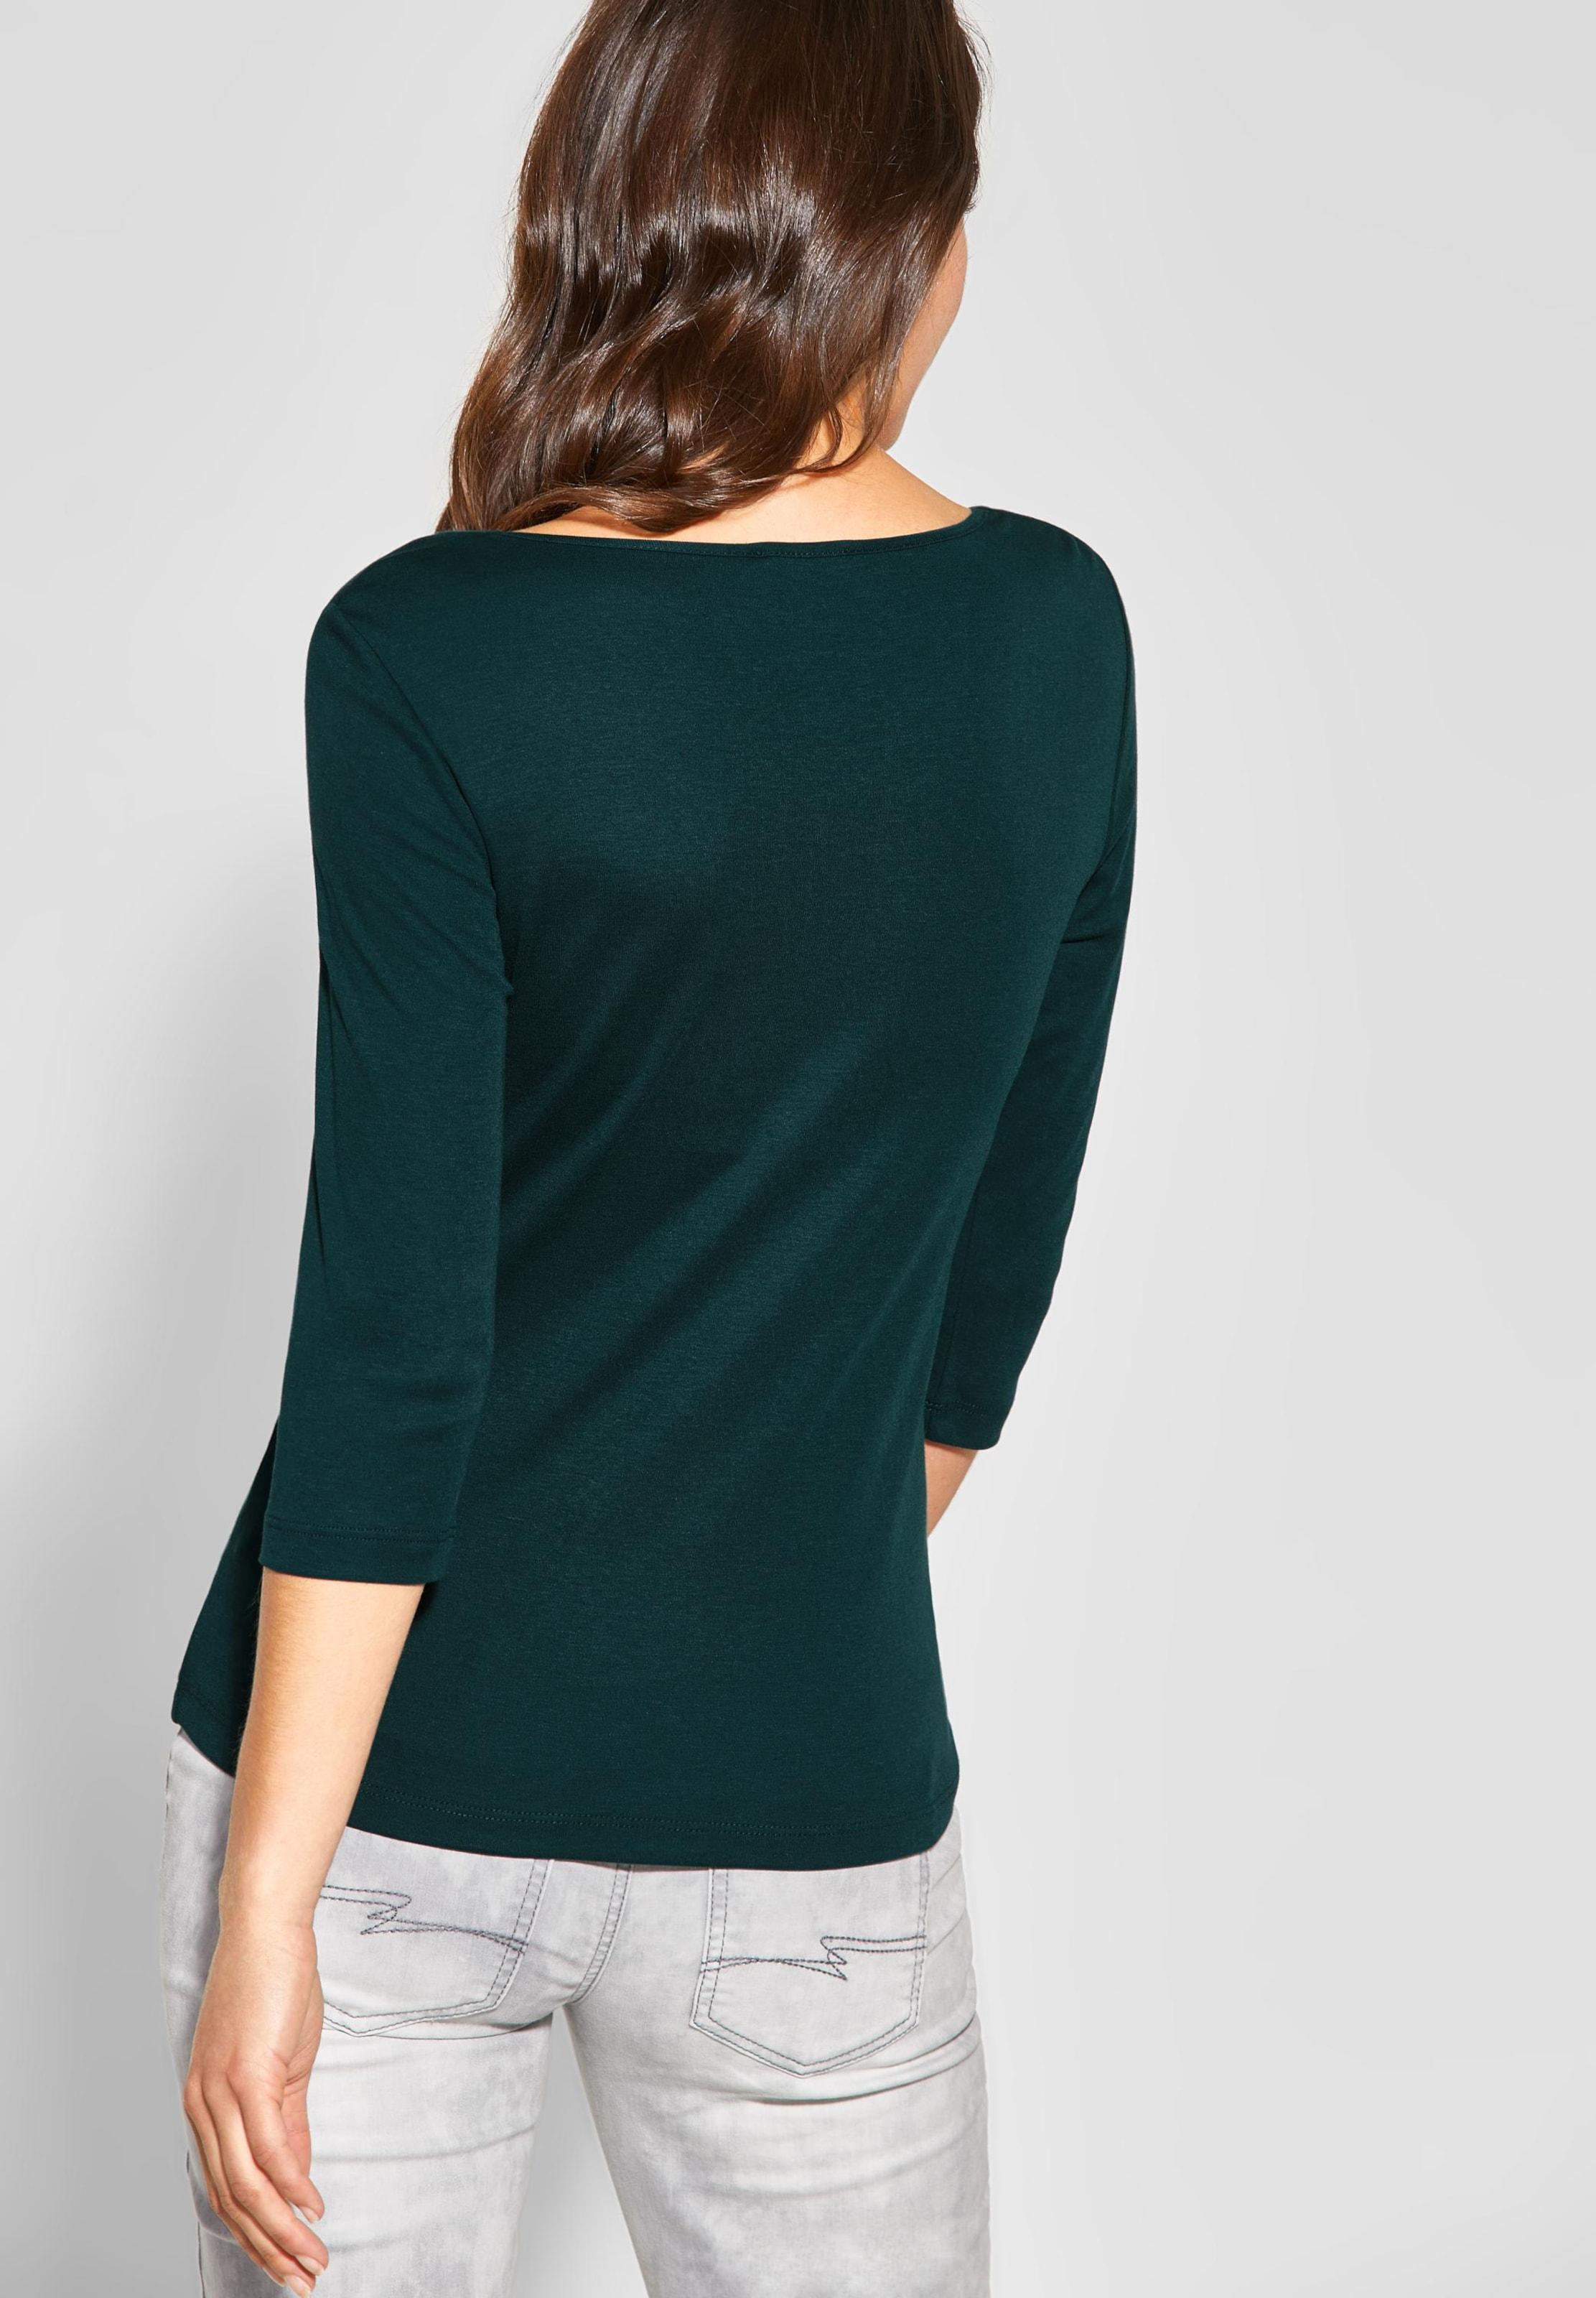 In Street One 'pania' Smaragd Shirt NOPyvm08nw